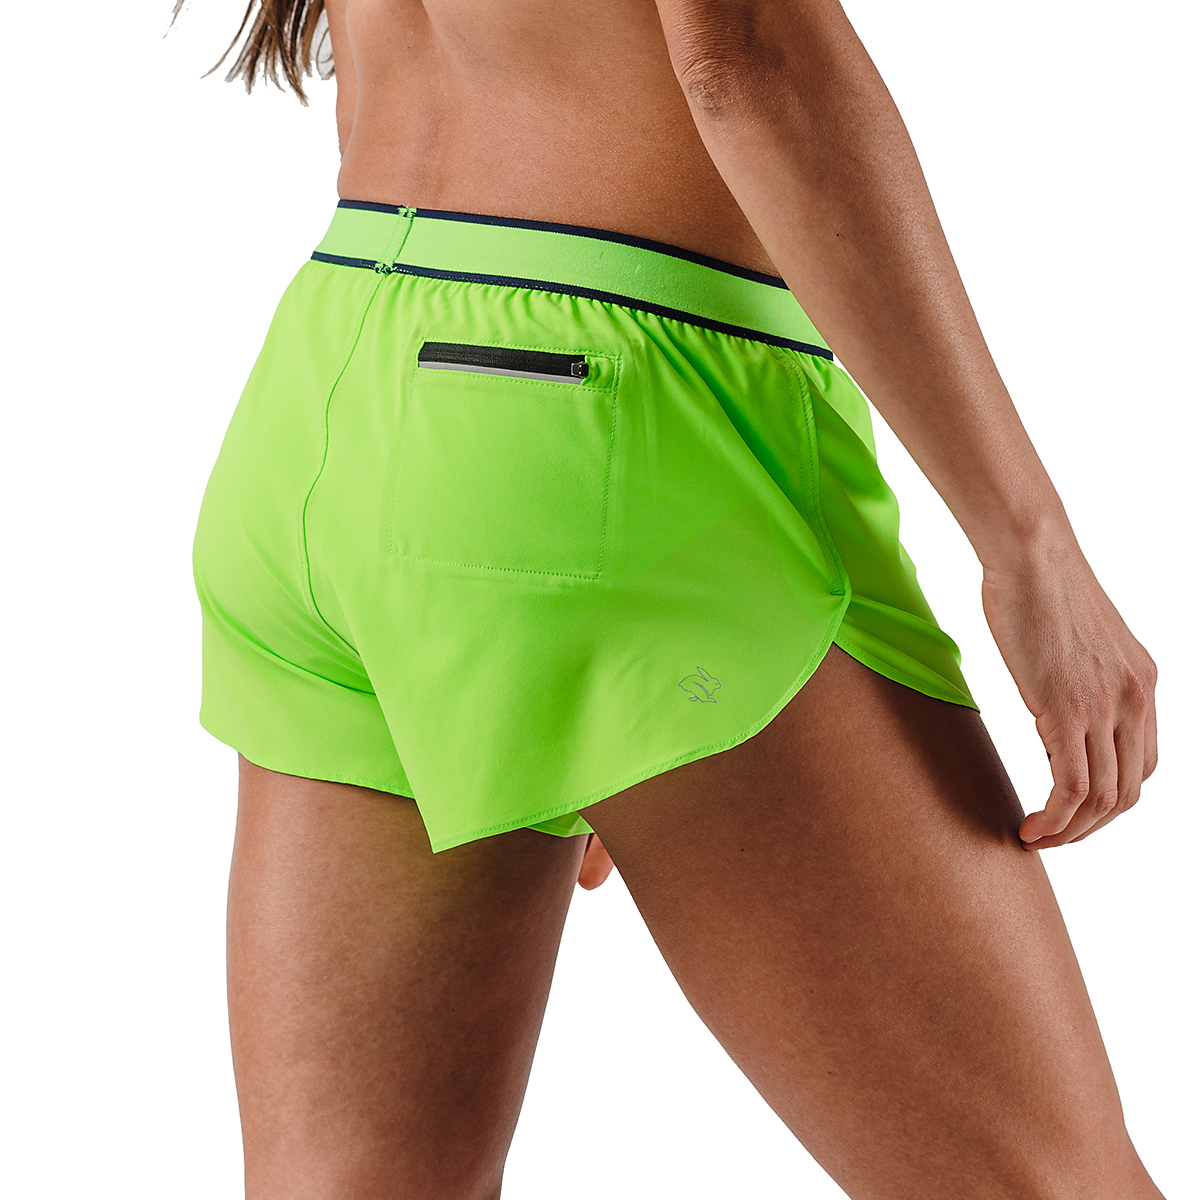 "Women's Rabbit Winner 2.0 2"" Running Shorts, , large, image 3"